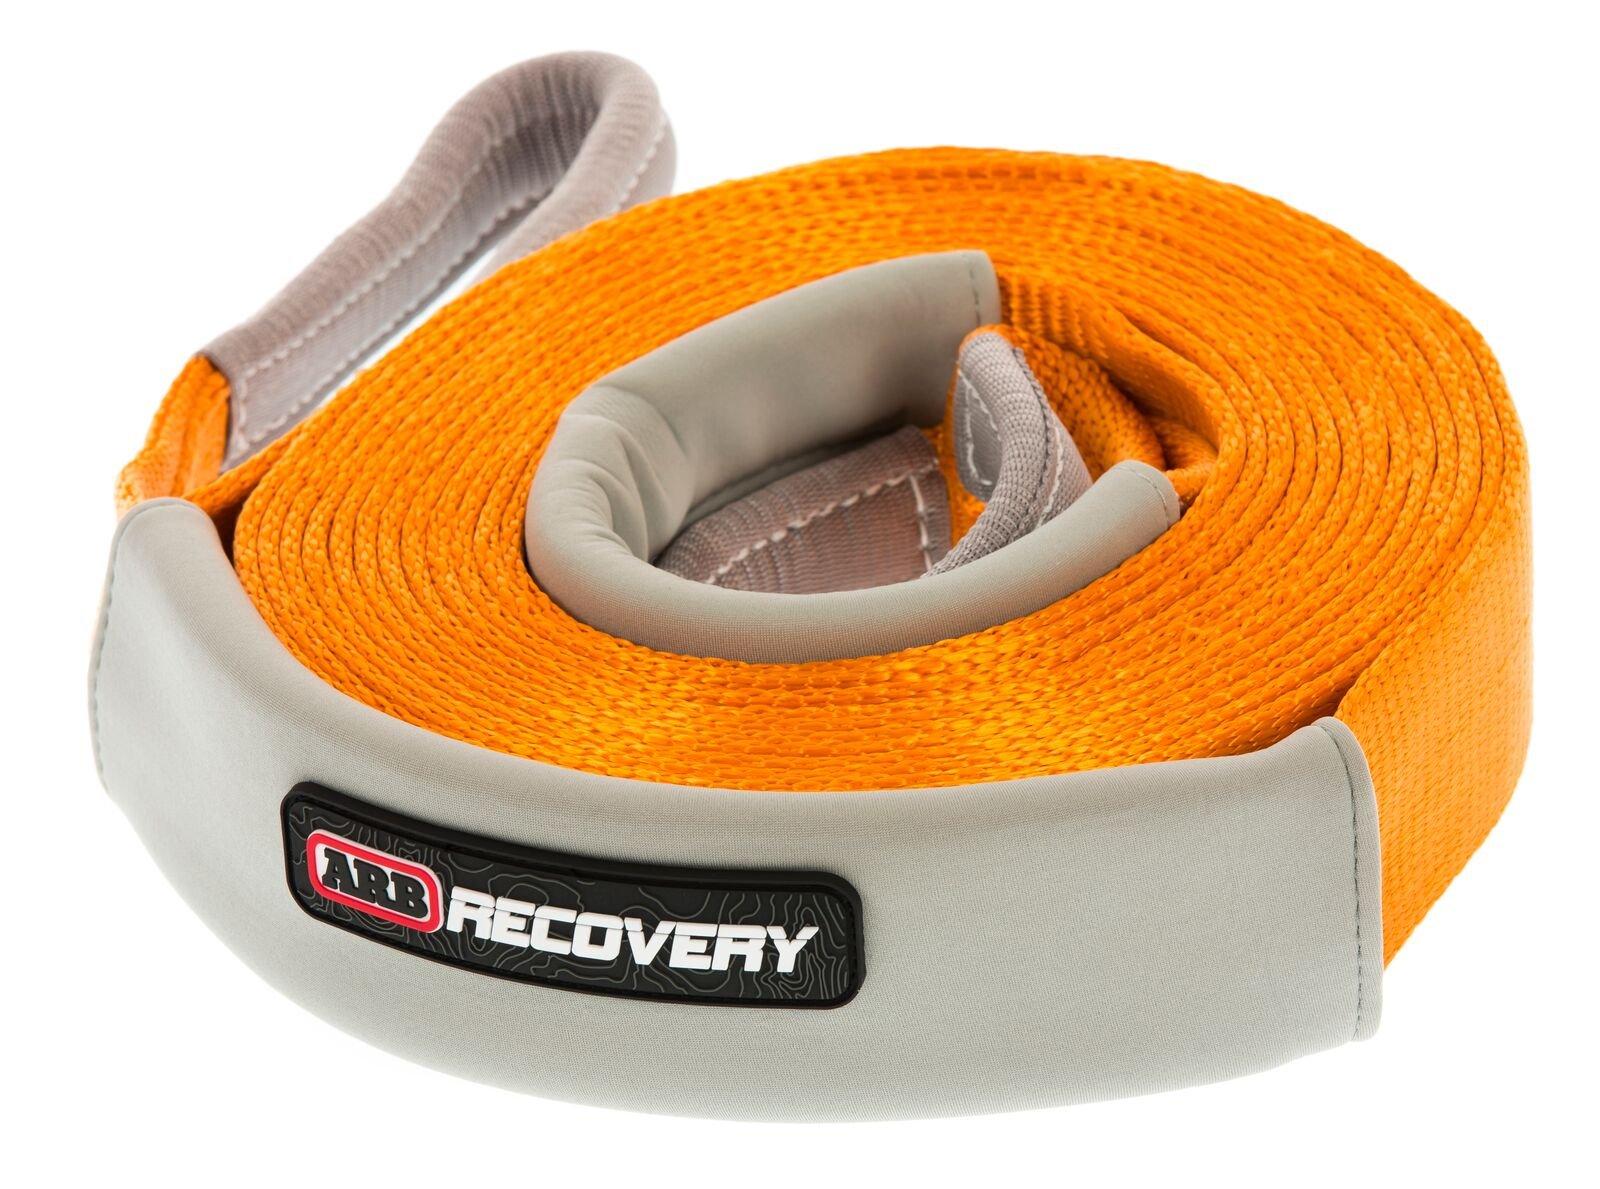 ARB ARB705LB Orange 30' x 2 3/8'' Snatch Strap Recovery by ARB